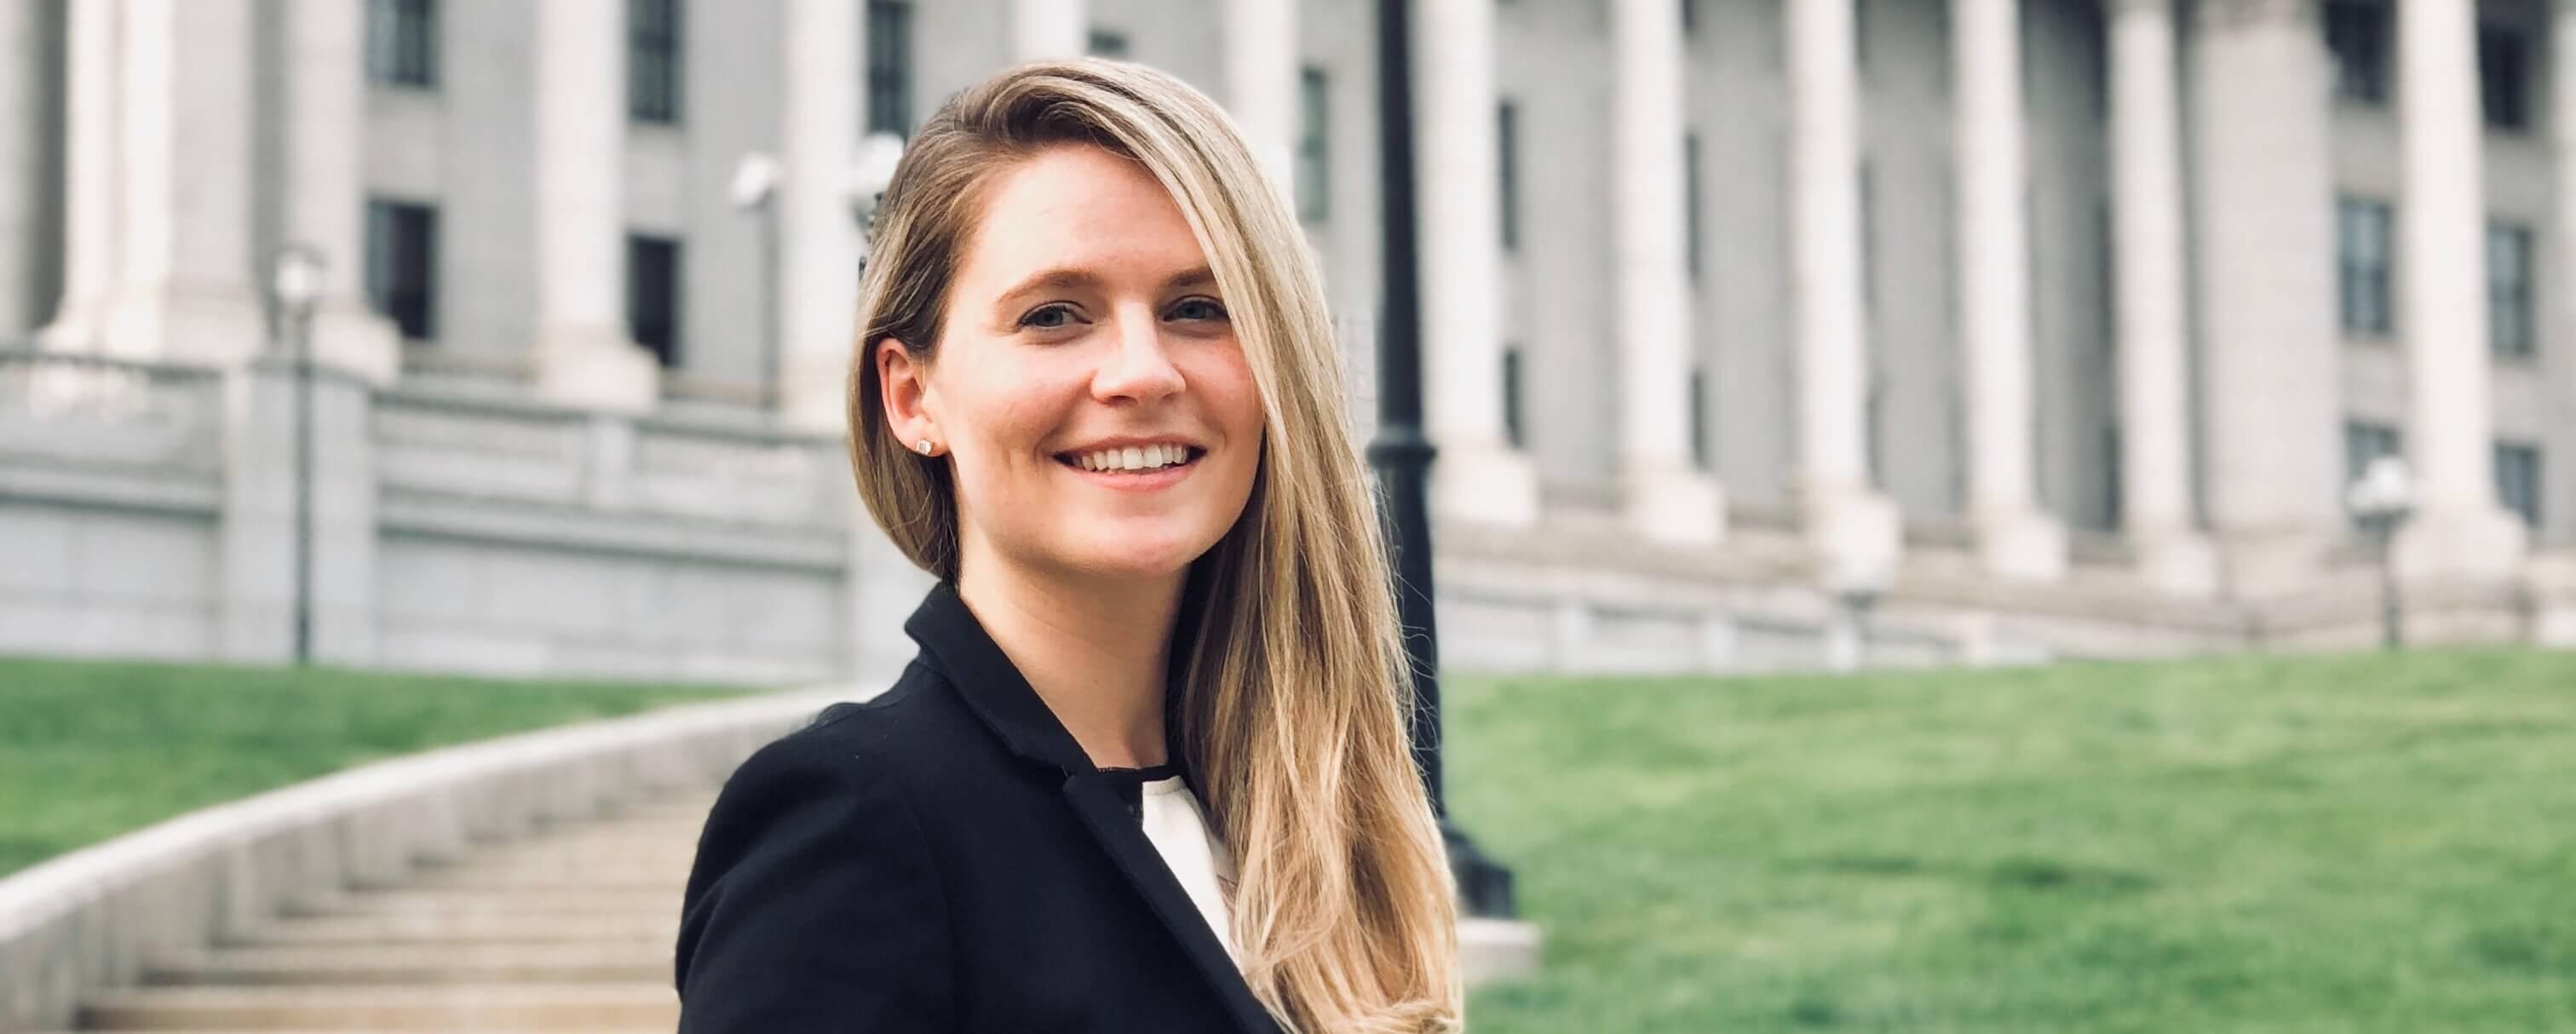 'Why Qualtrics' – Chelsie Bright, XM Scientist